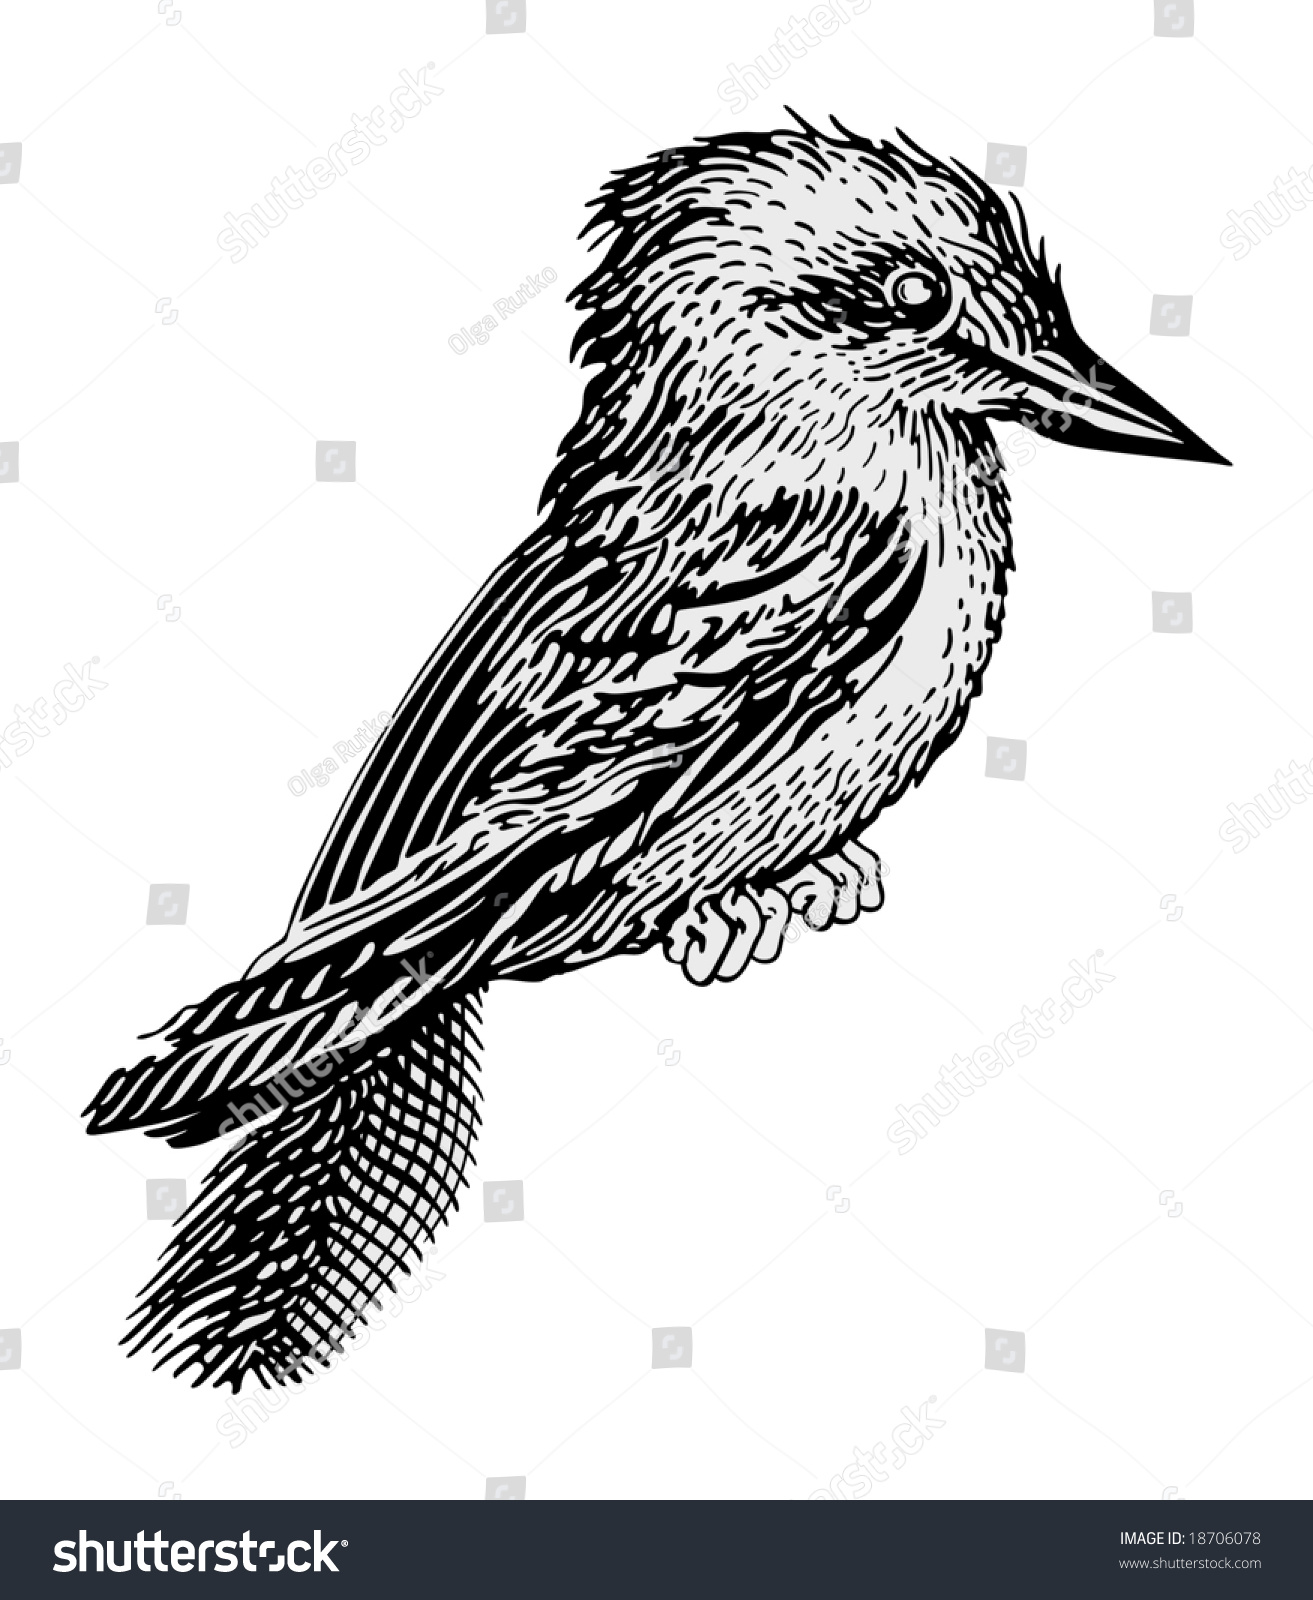 Line Drawing Kingfisher : Kingfisher vector stock shutterstock